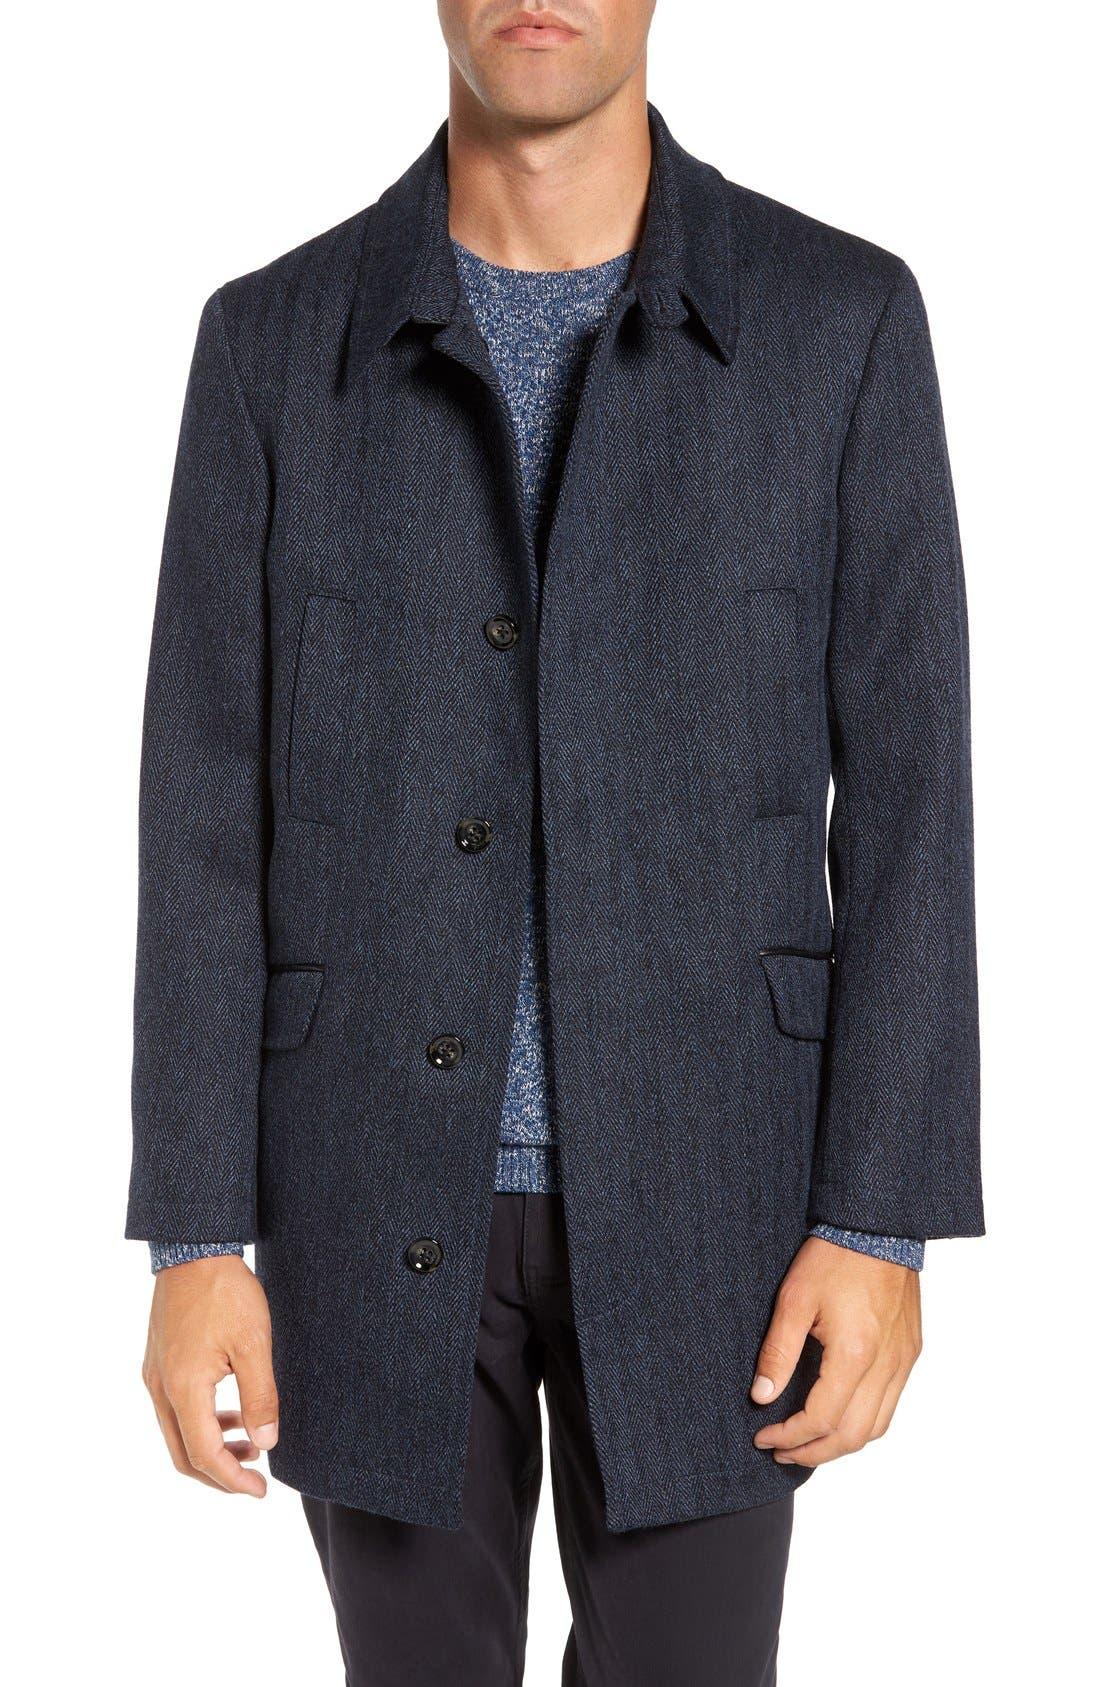 Rodd & Gunn 'Garlands' Herringbone Wool Tweed Overcoat